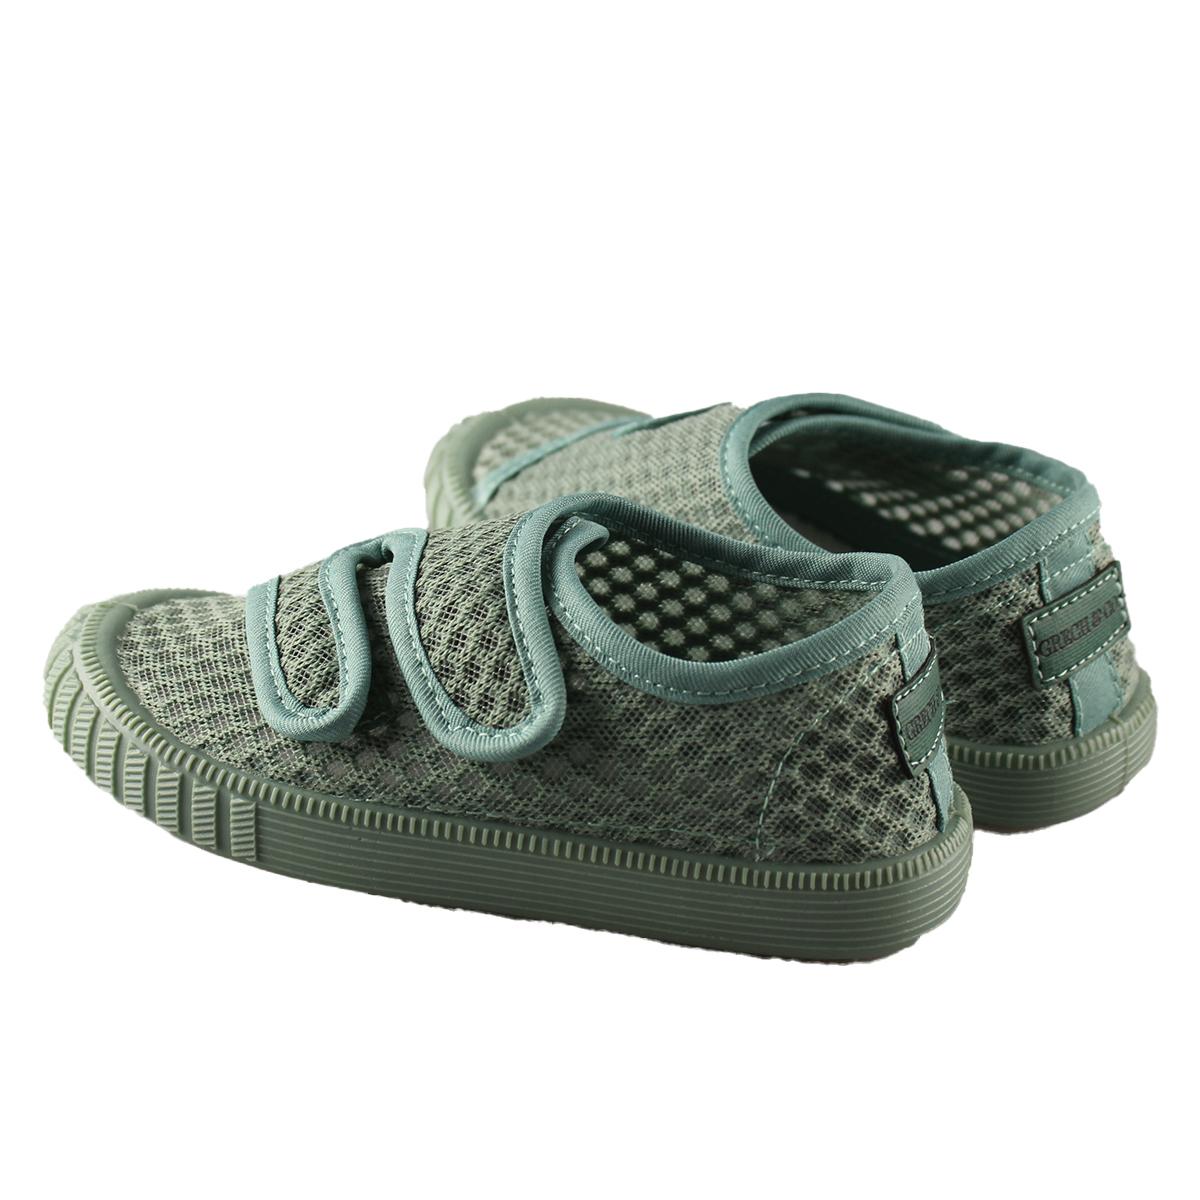 Chaussons & Chaussures Baskets Respirantes à Scratch Fern - 24 Baskets Respirantes à Scratch Fern - 24